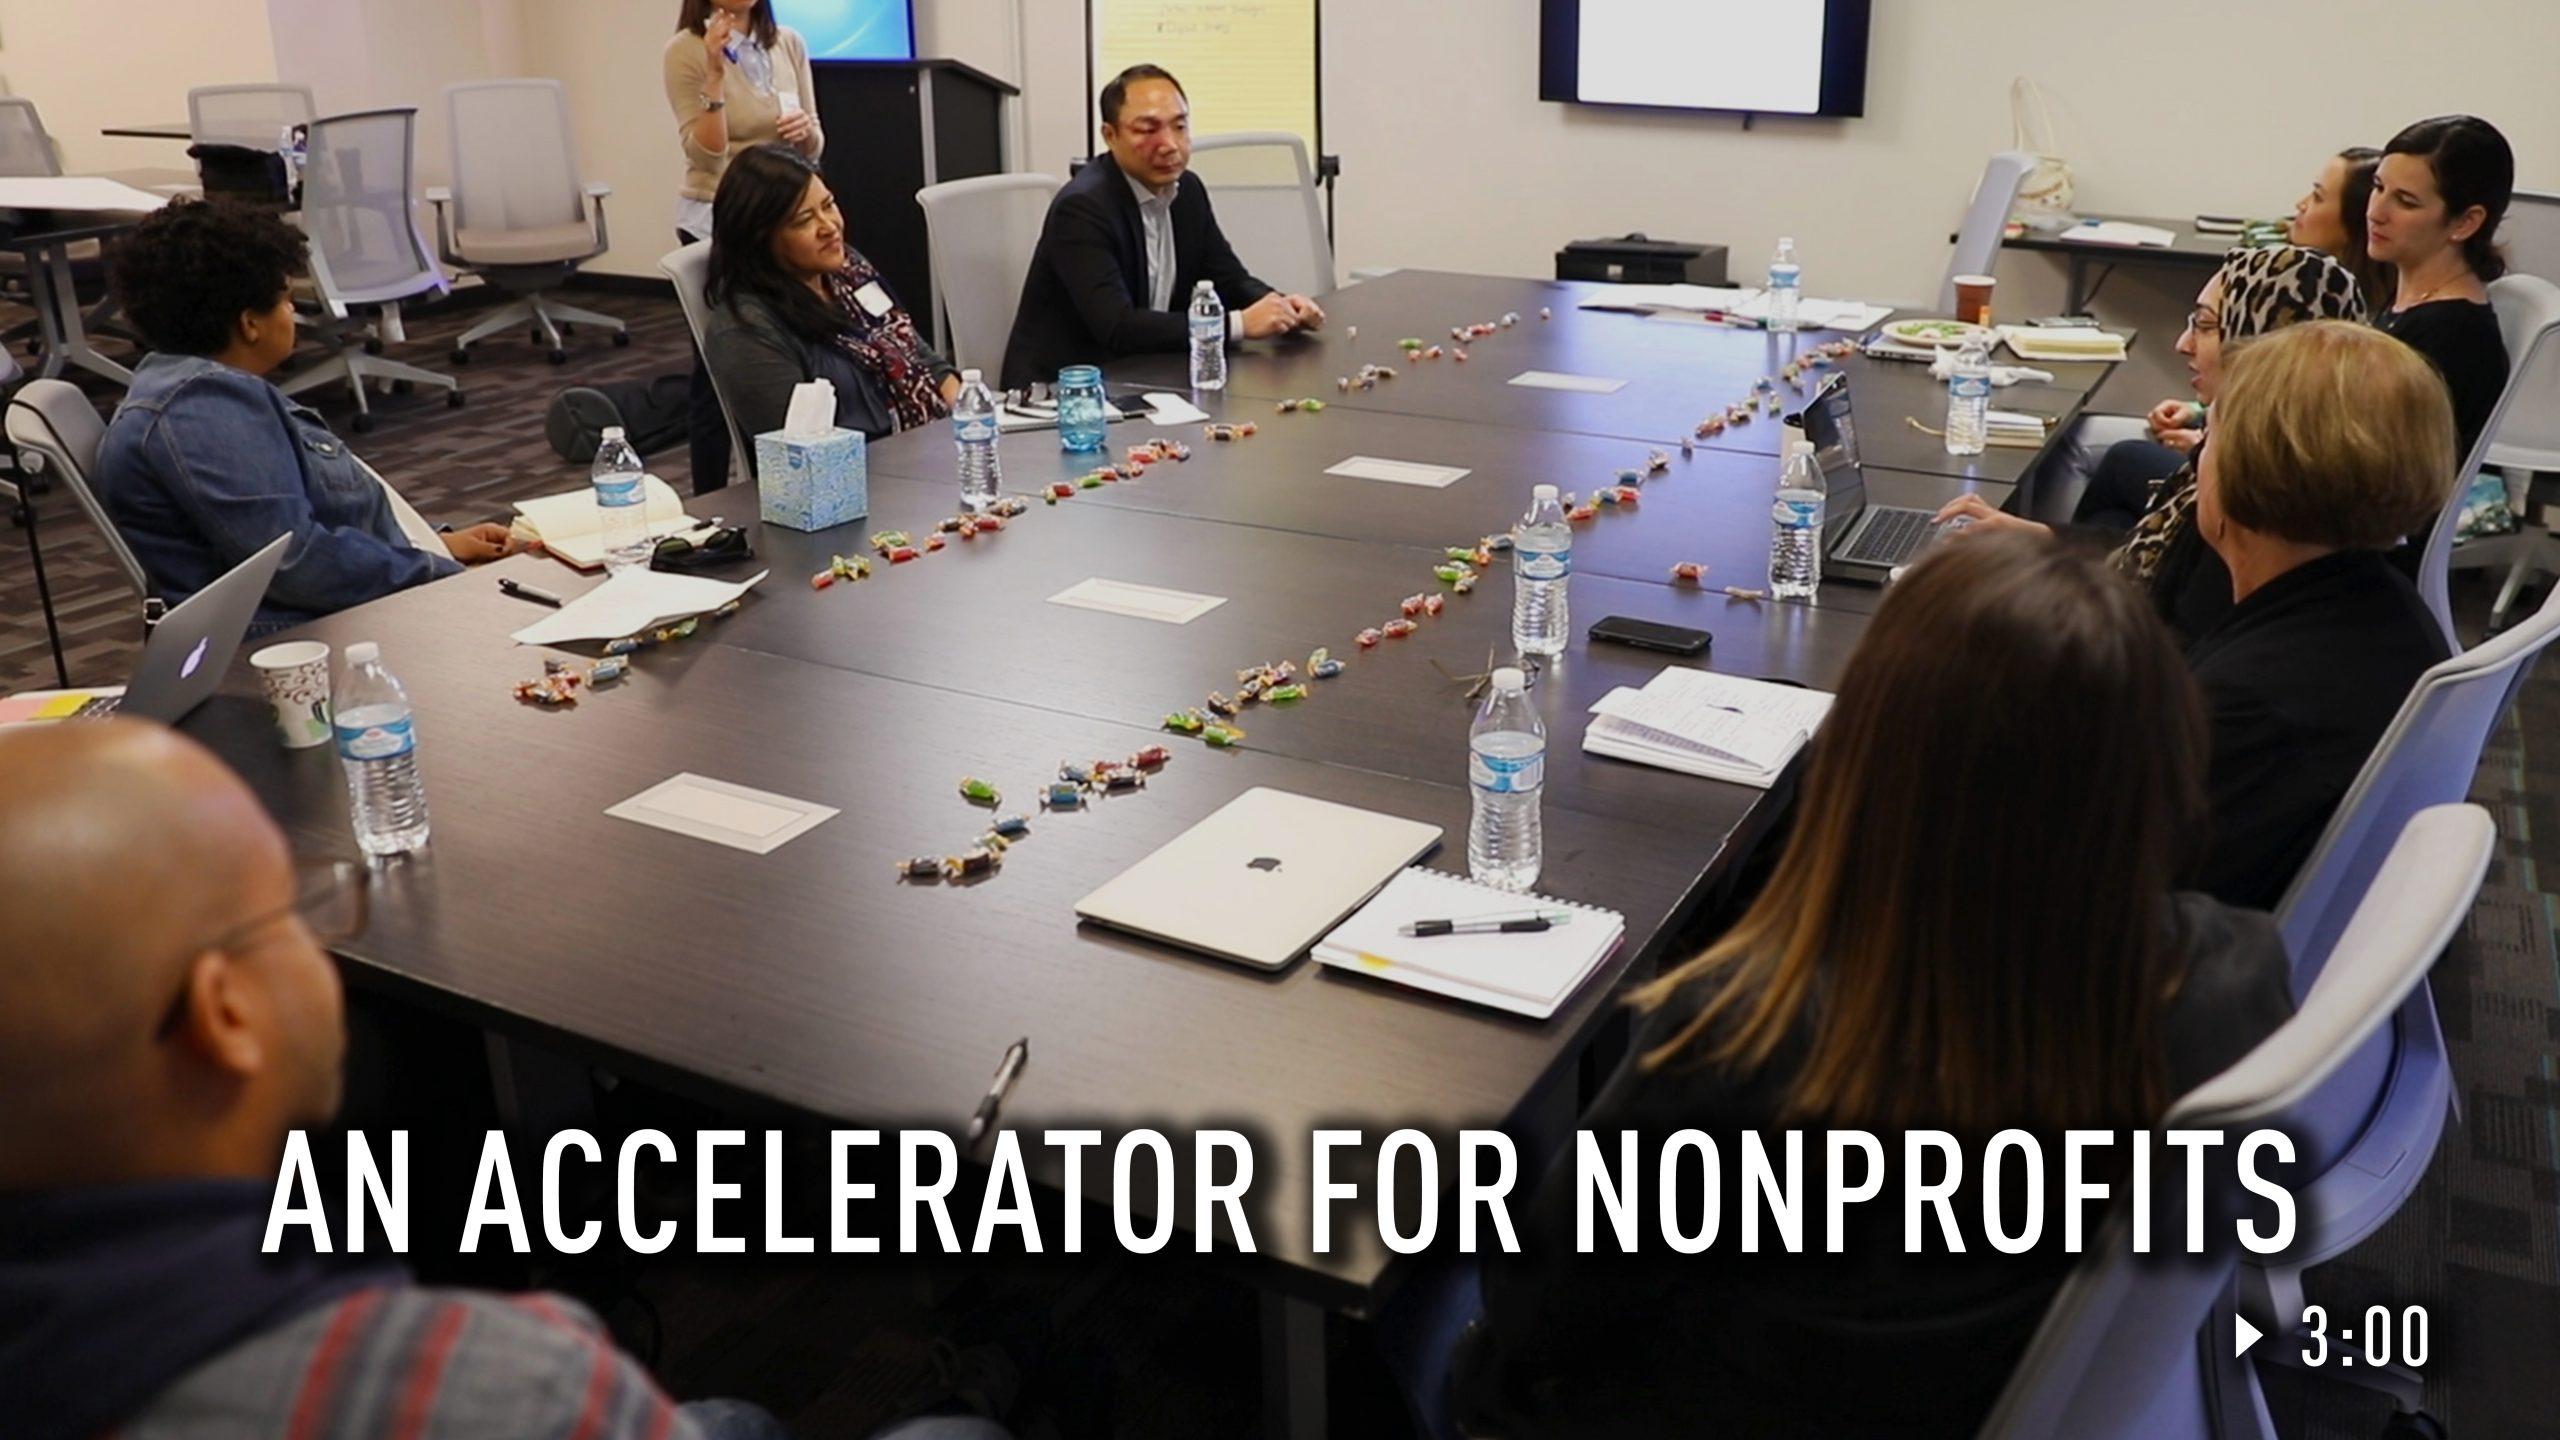 The Nonprofit Accelerator